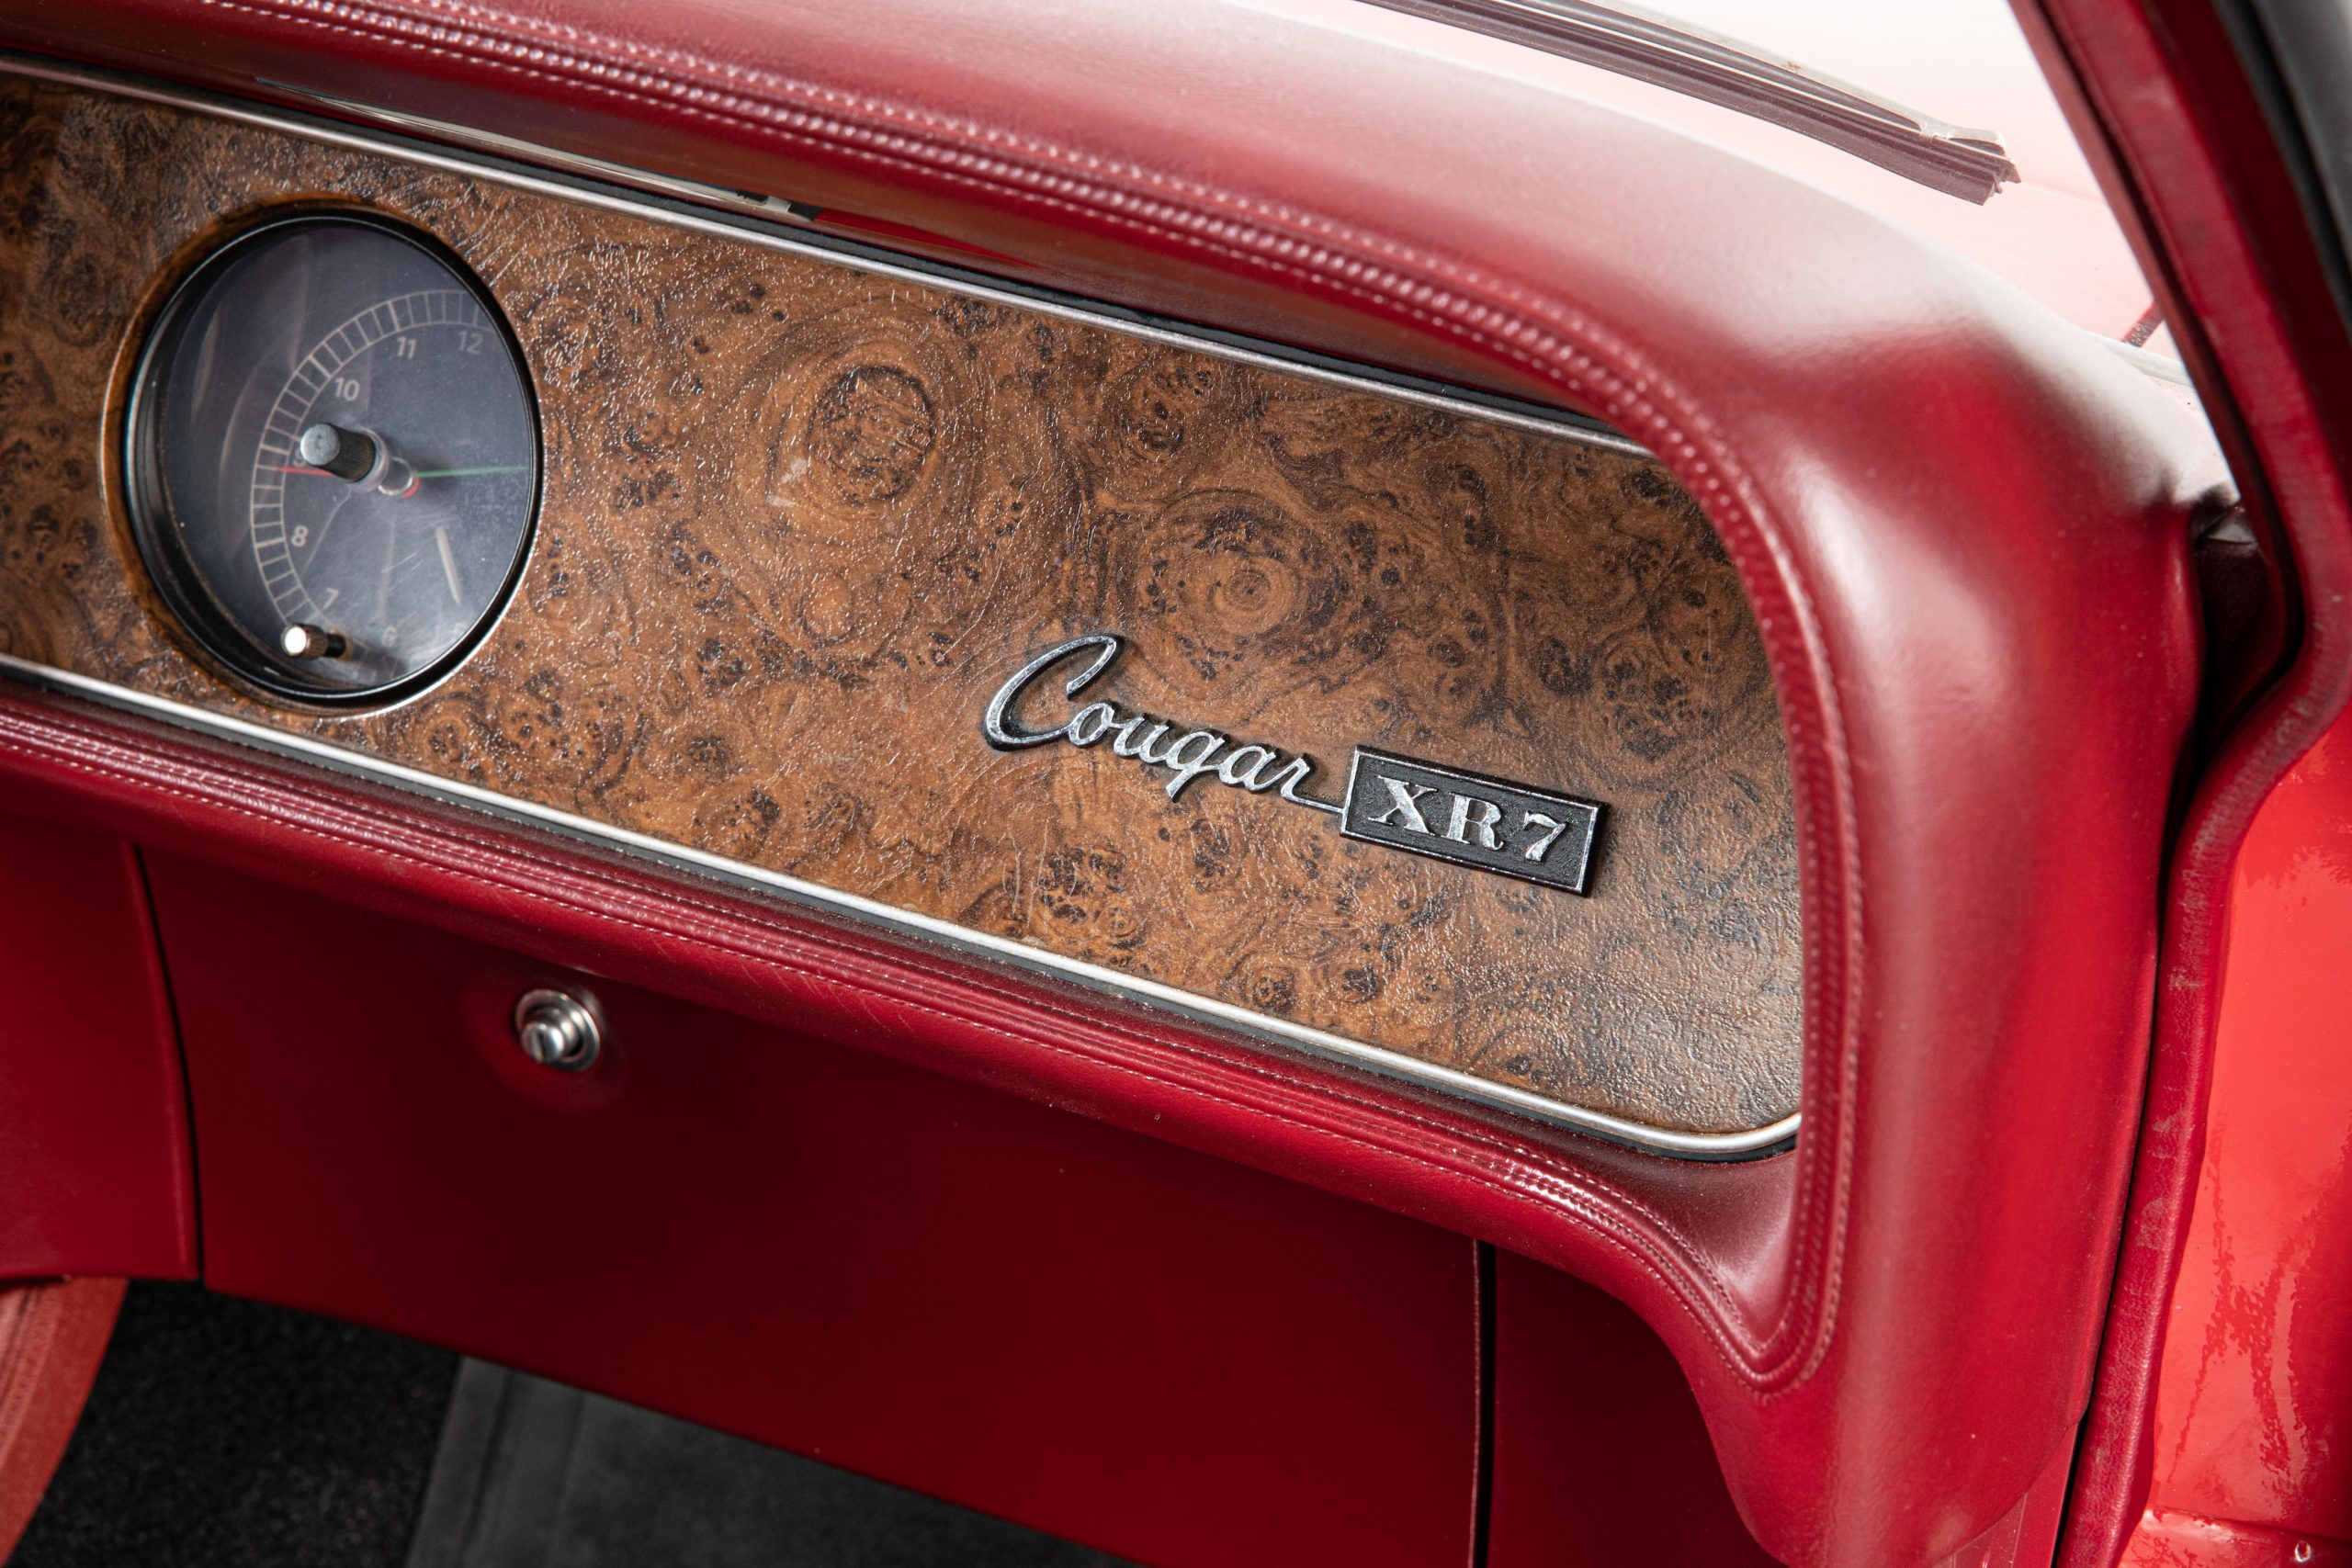 Mercury Cougar Convertible dash lettering detail